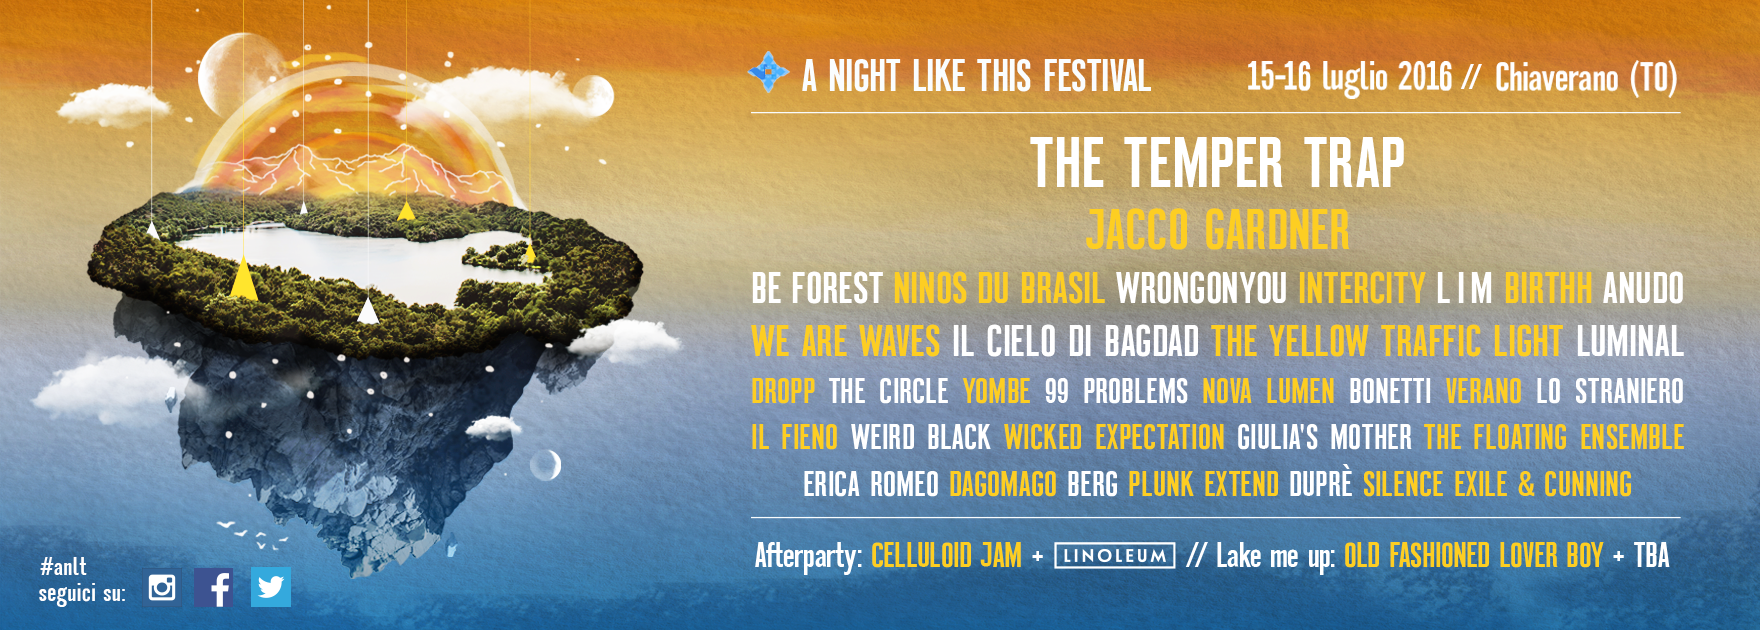 La LineUp di A Night Like This Festival 2016!